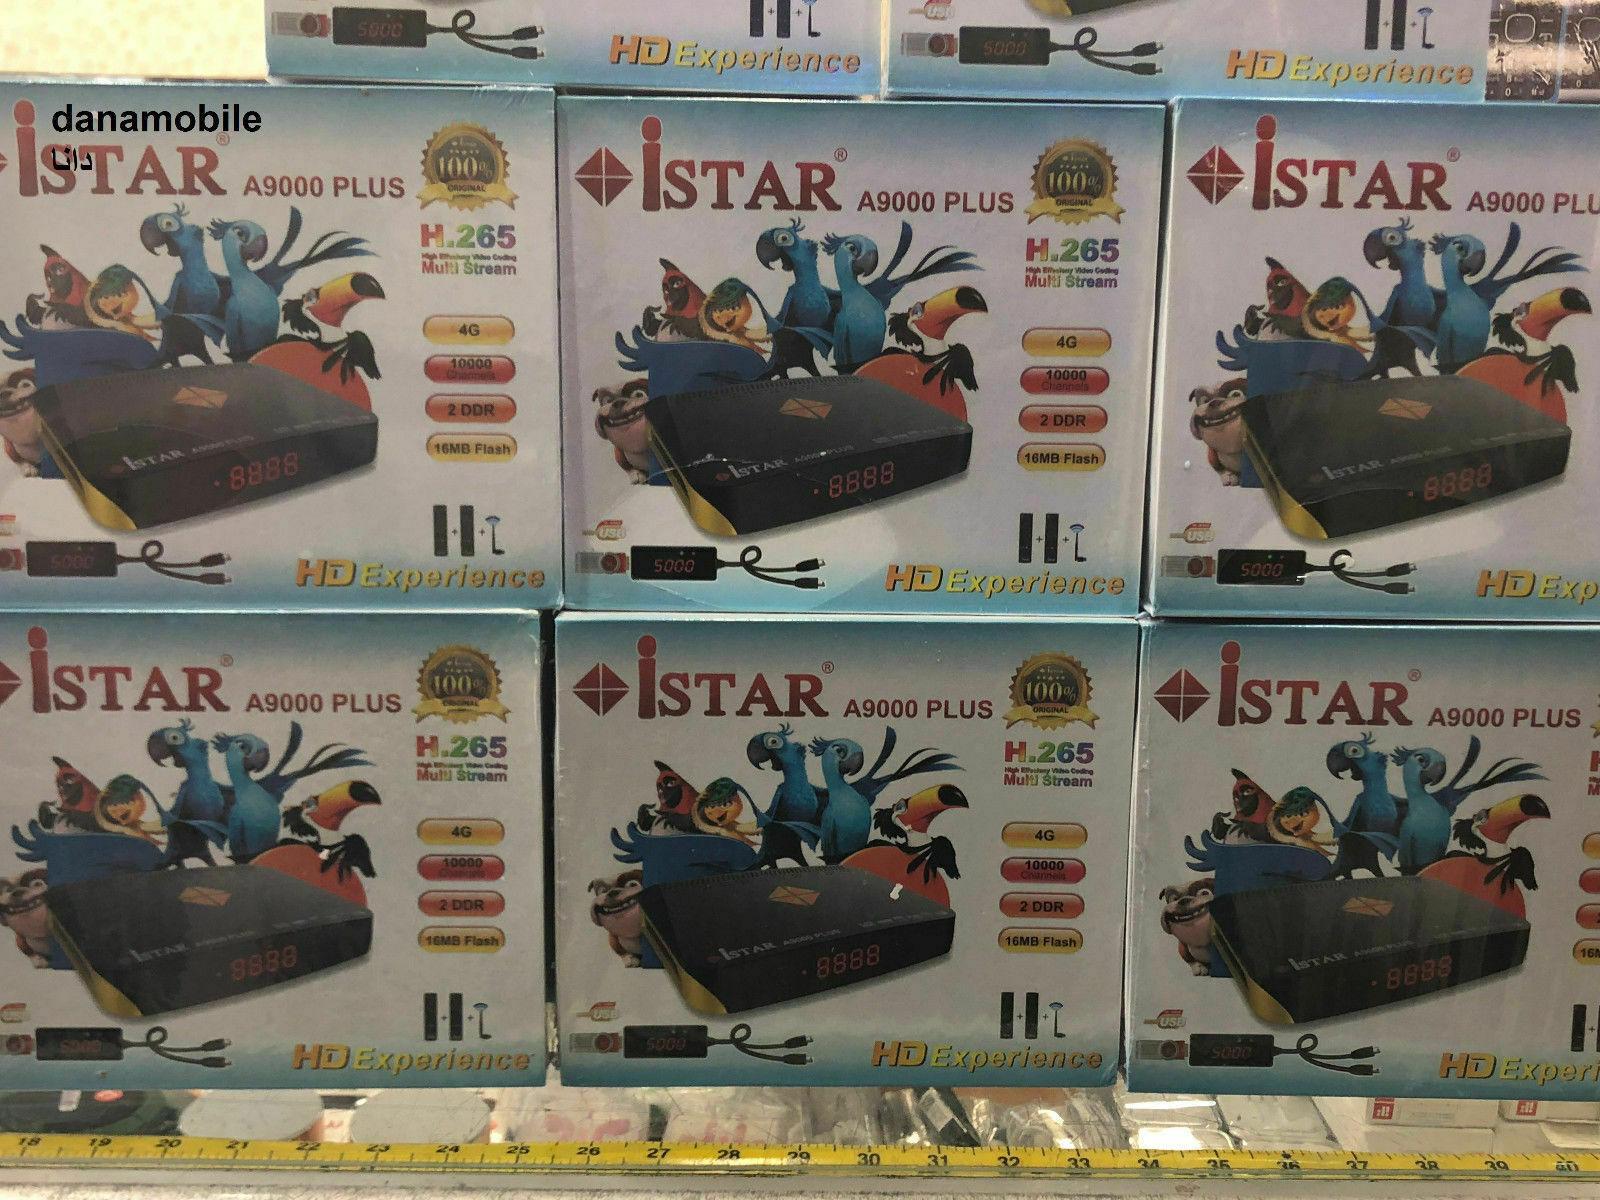 istar korea A9000 Plus 4G 6 Months Free Online Tv GBP 93 00